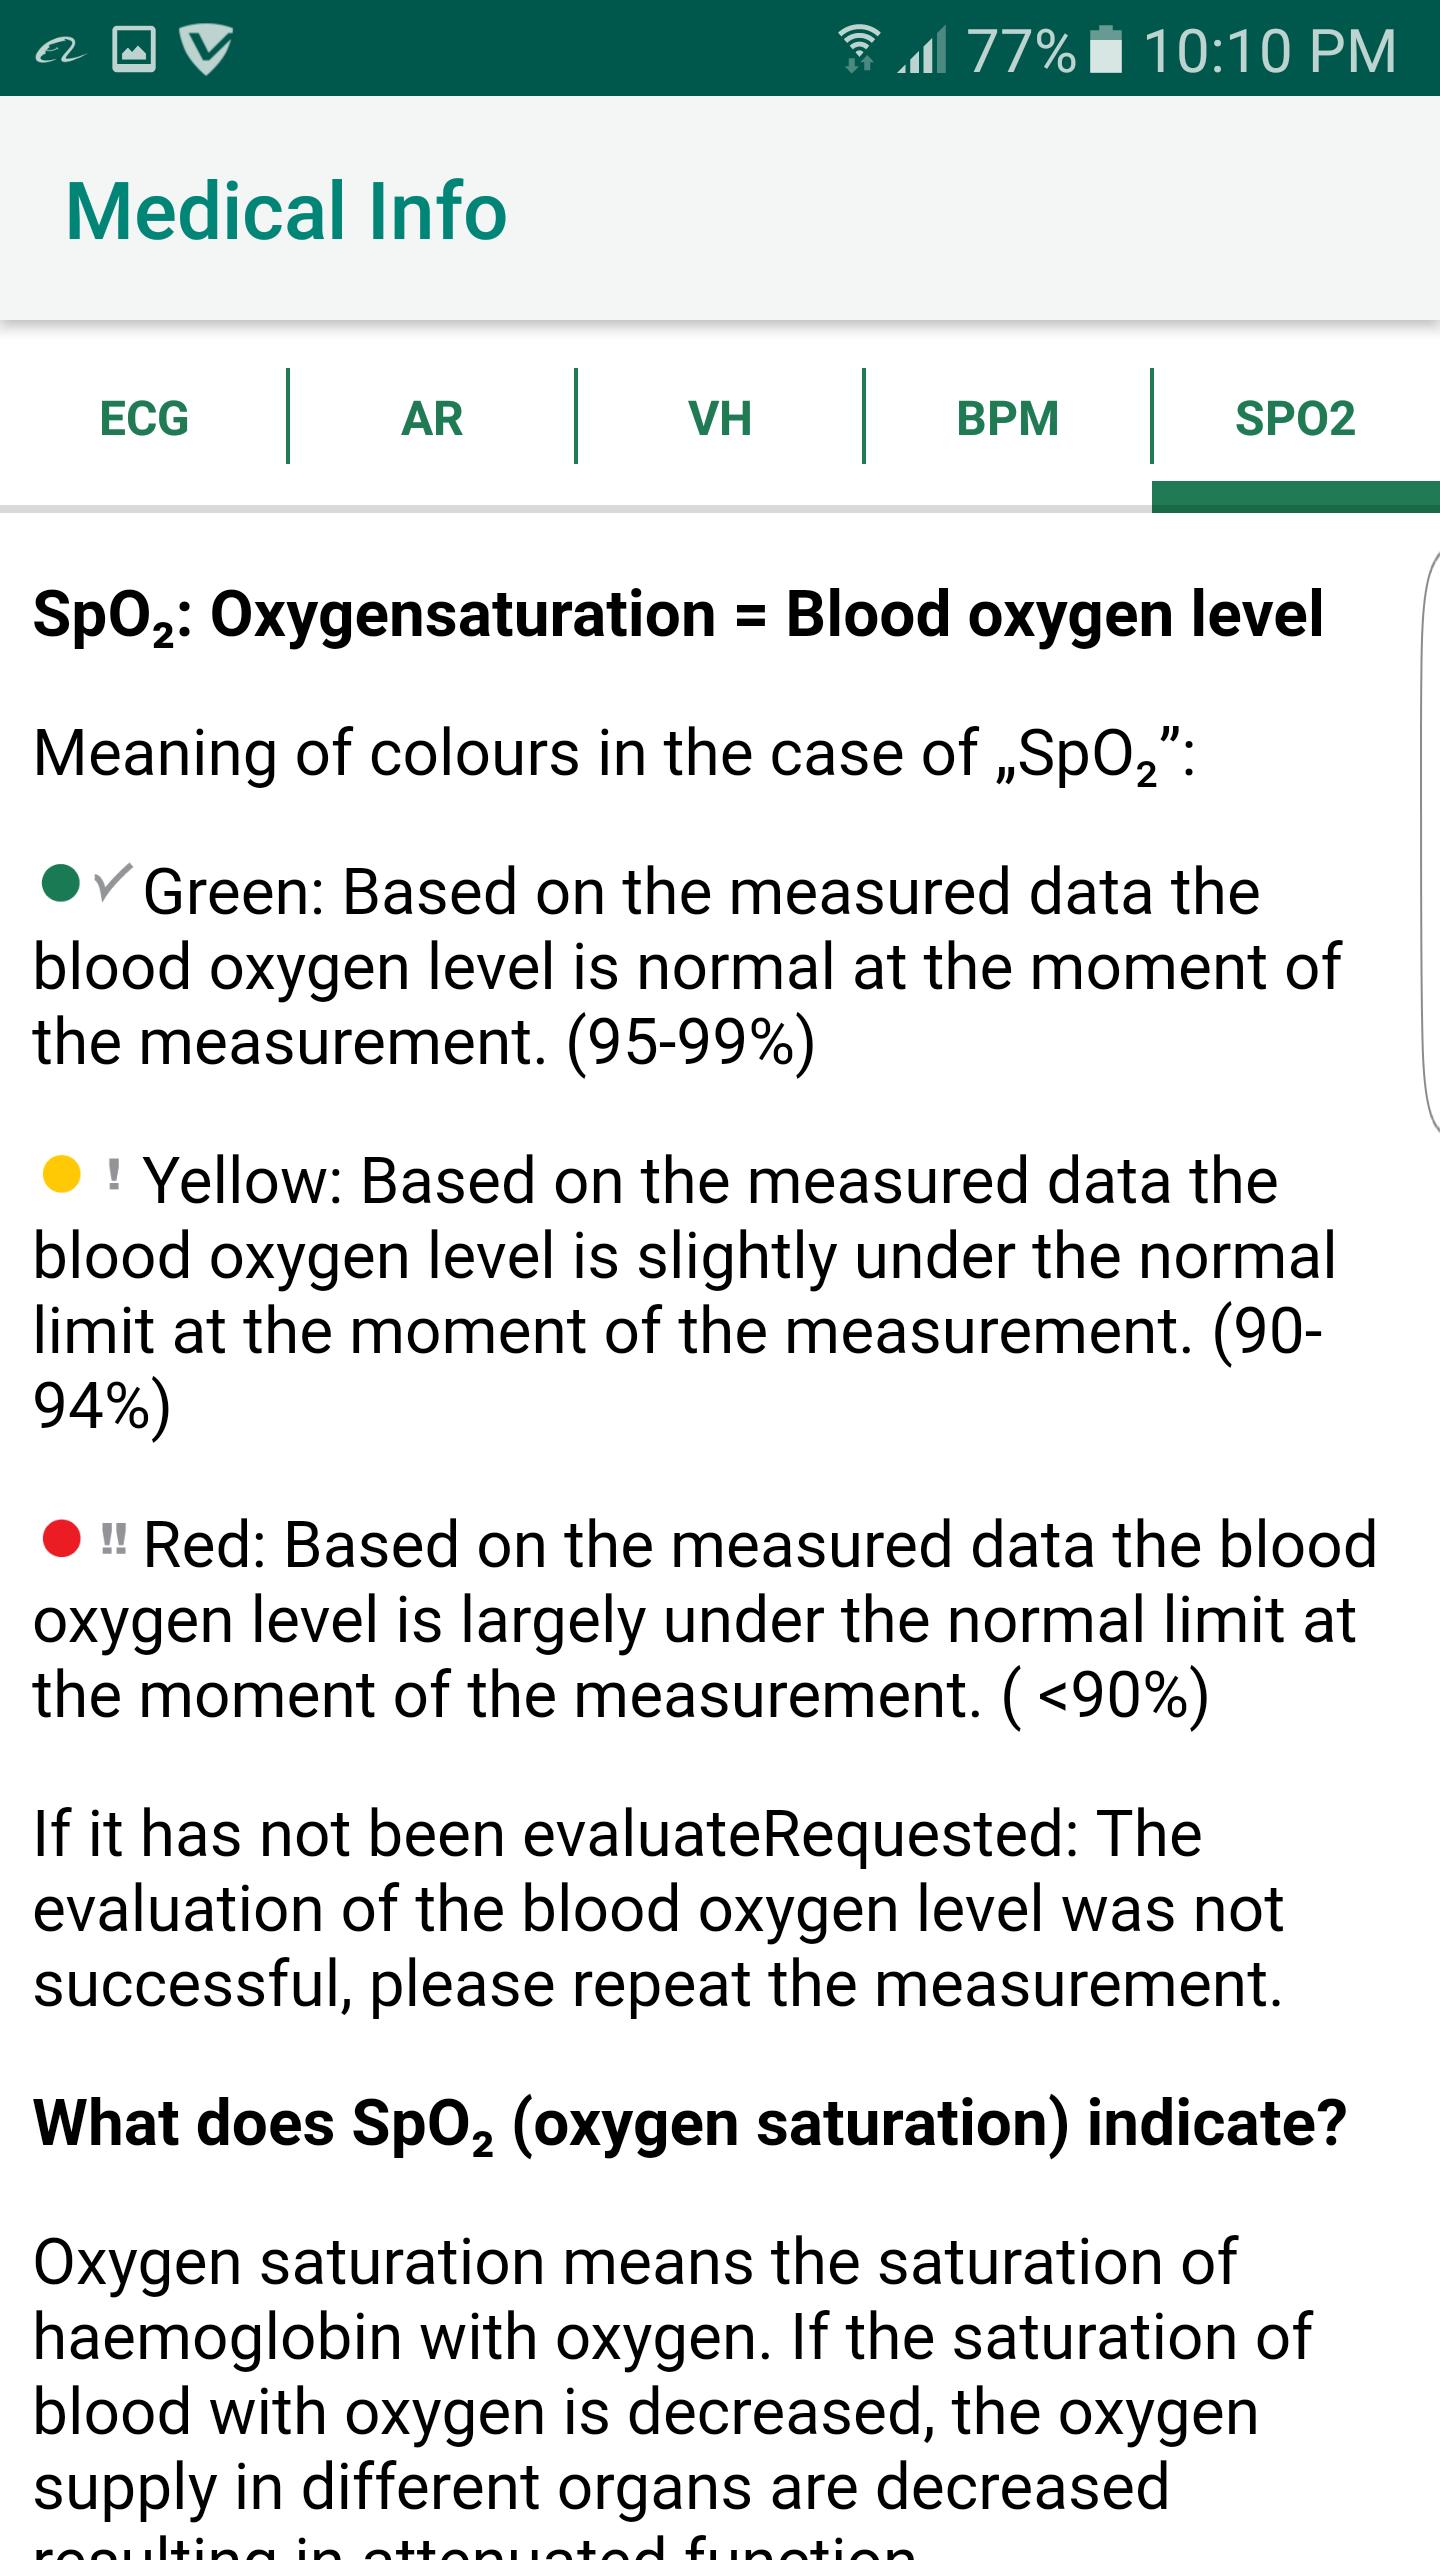 SpO2 Info